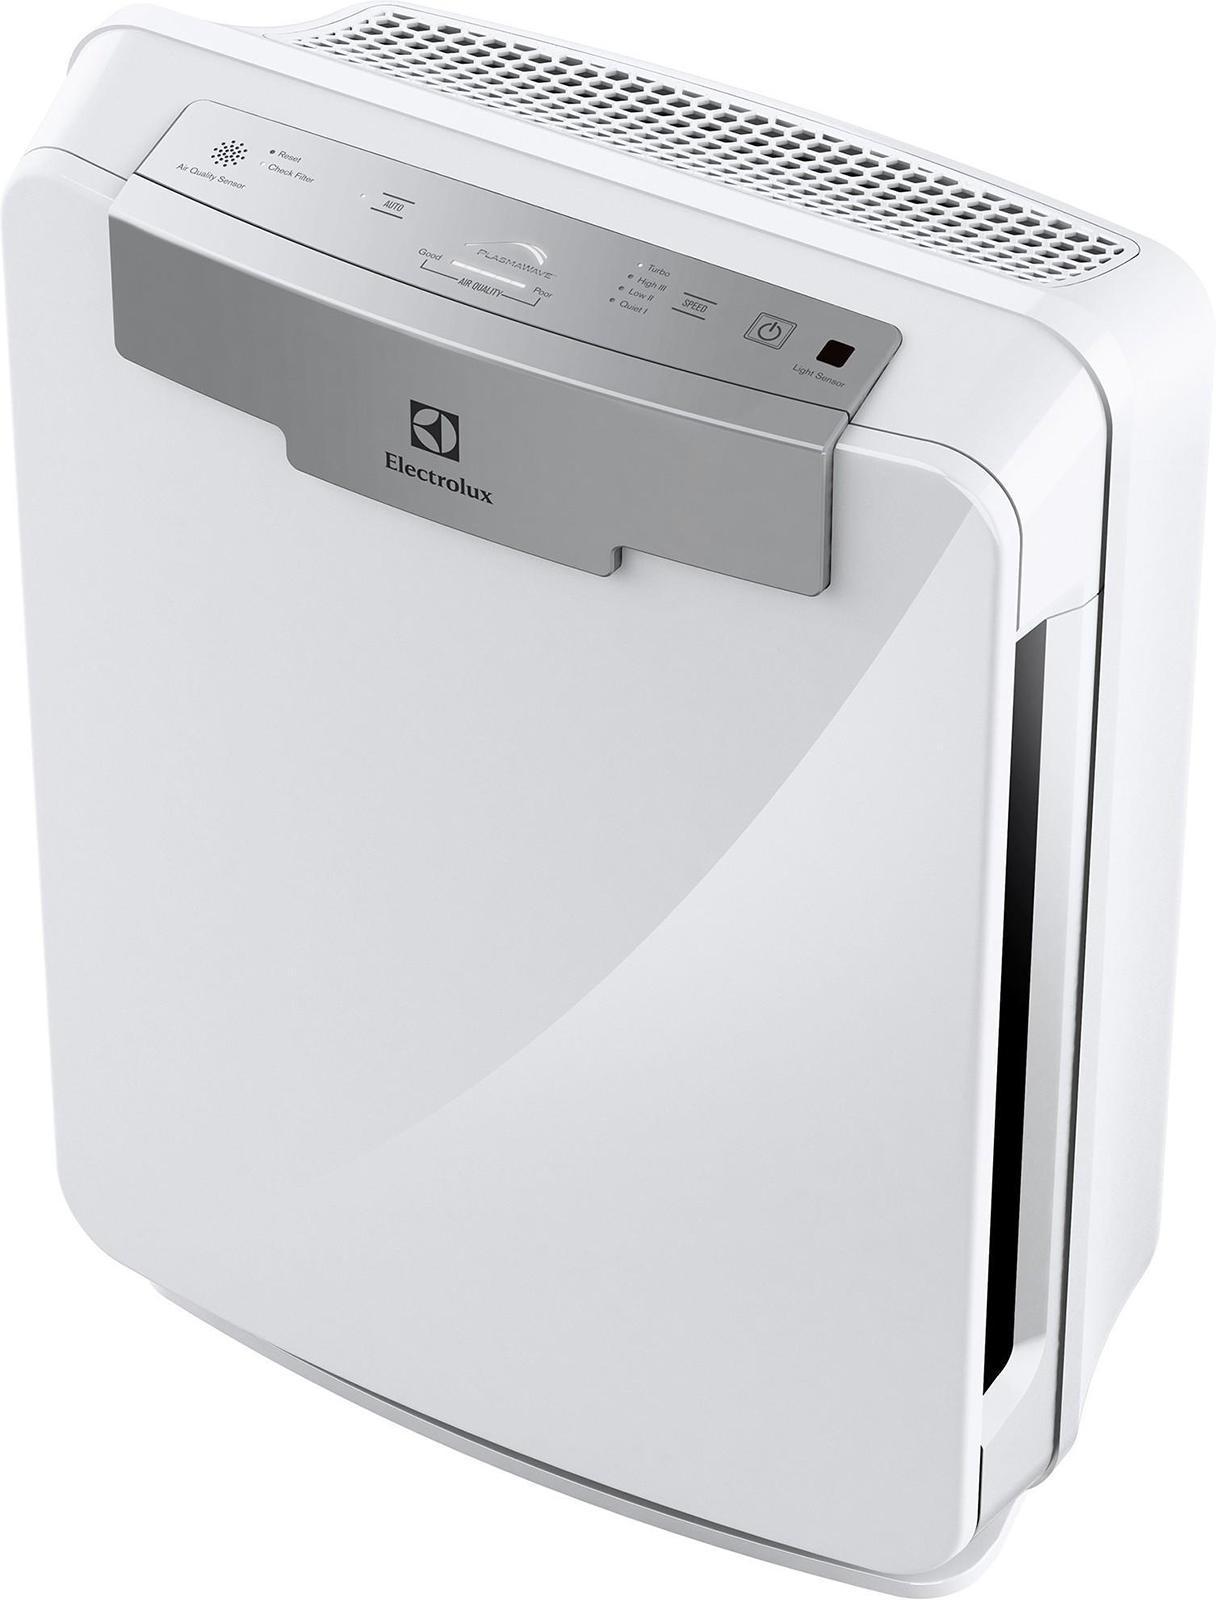 Electrolux EAP300 воздухоочиститель